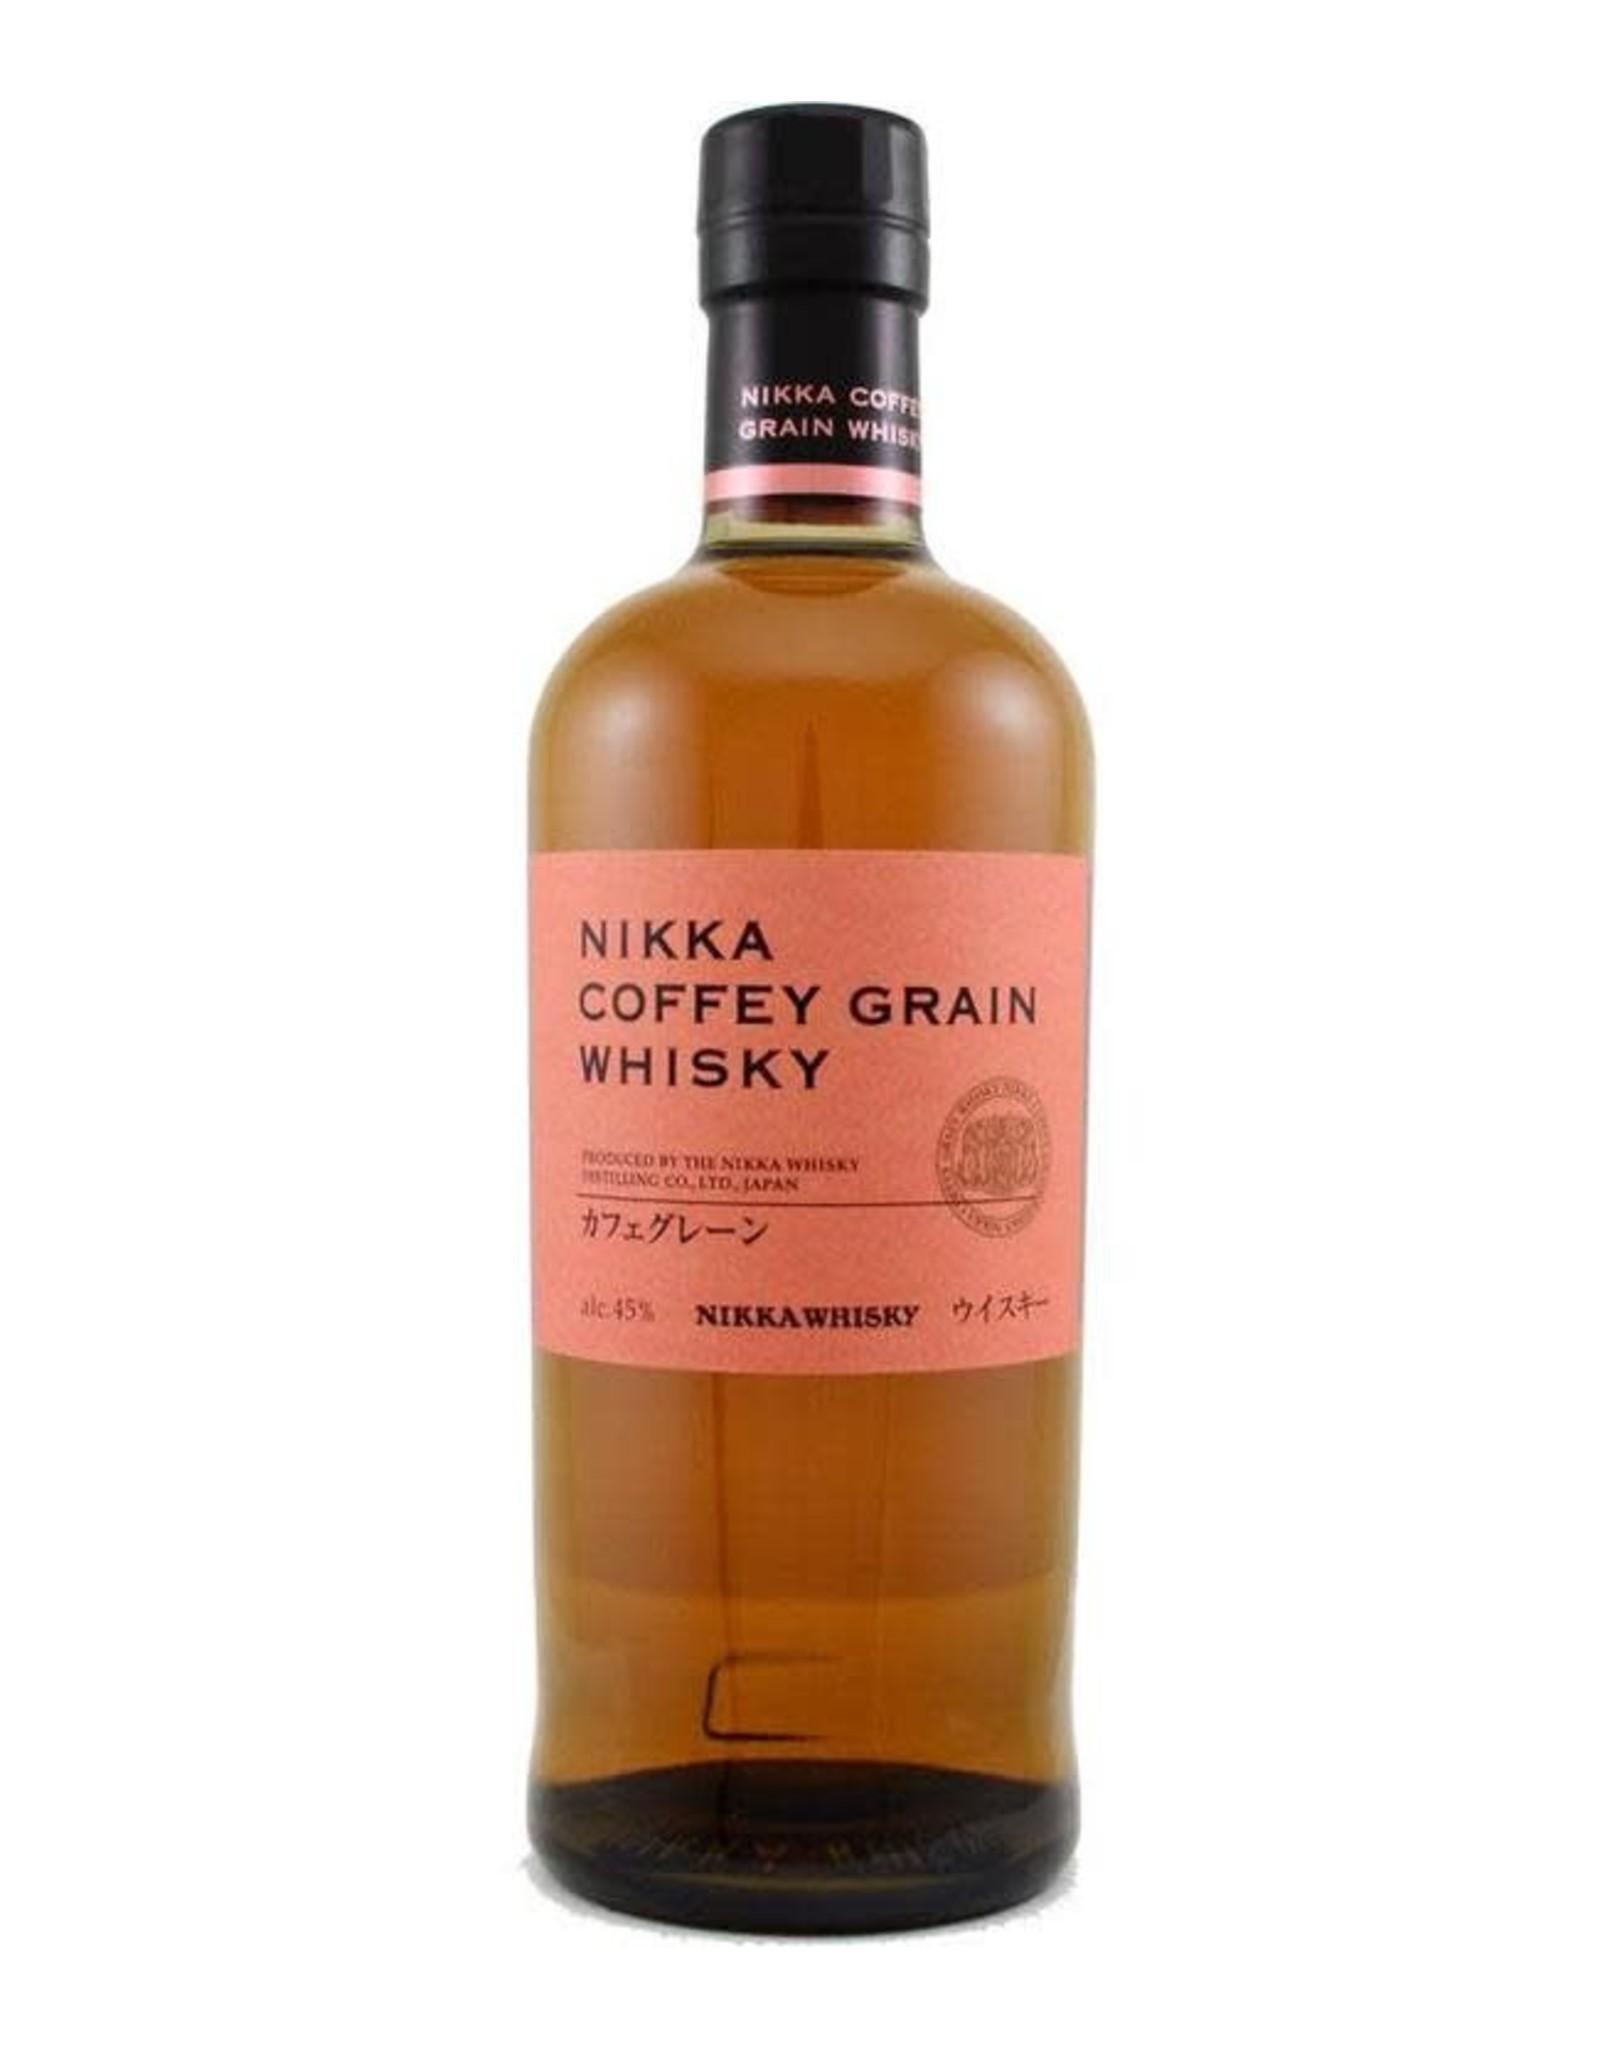 Japan Nikka Coffey Grain Whisky